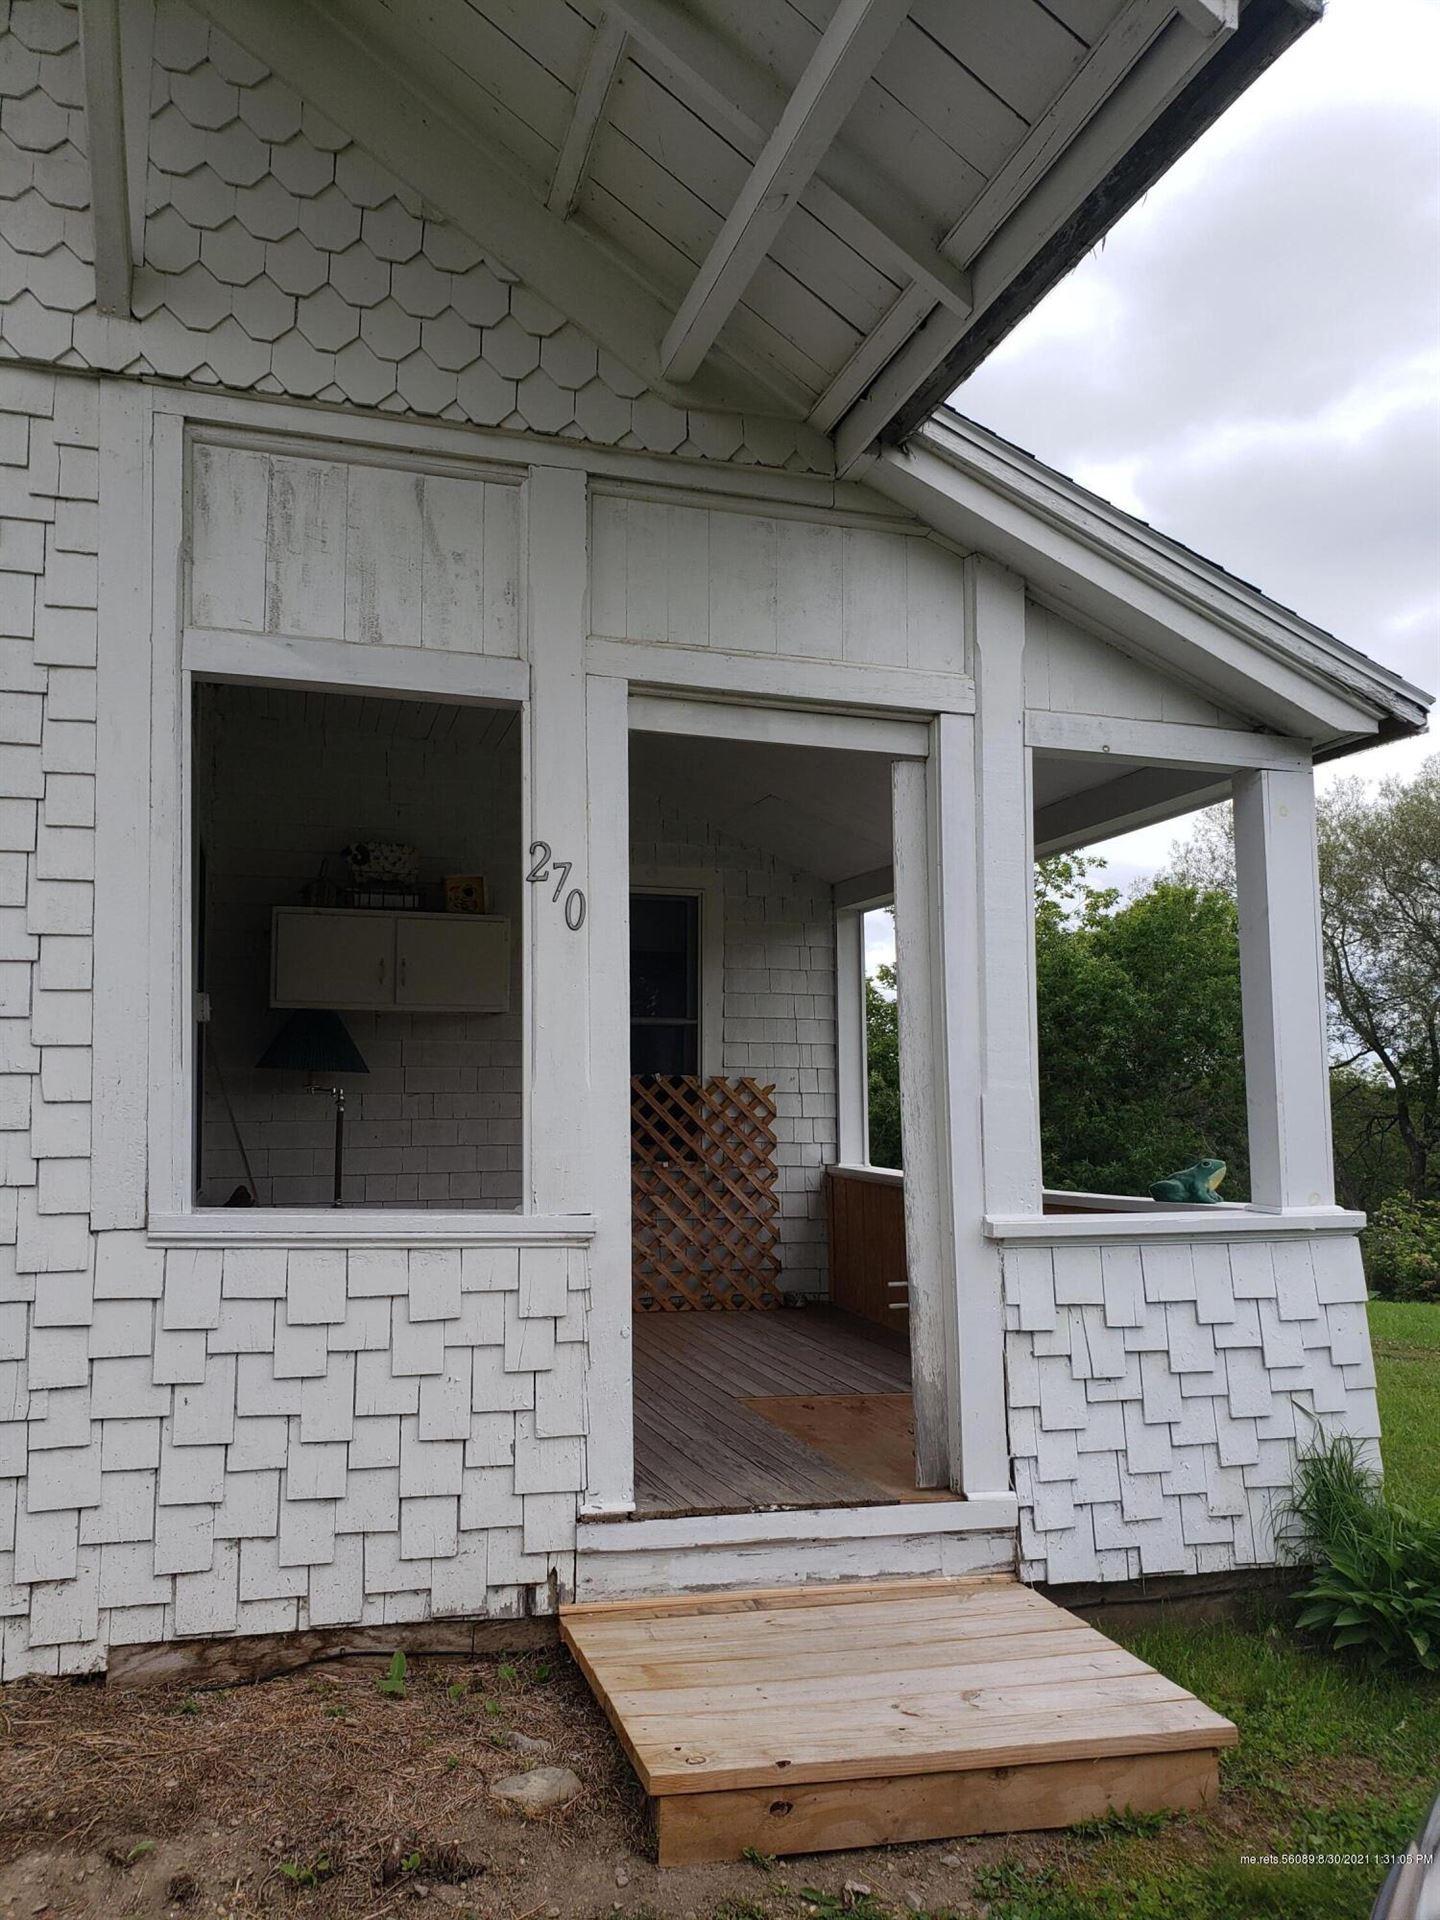 Photo of 270 Parson Street, Presque Isle, ME 04769 (MLS # 1505498)